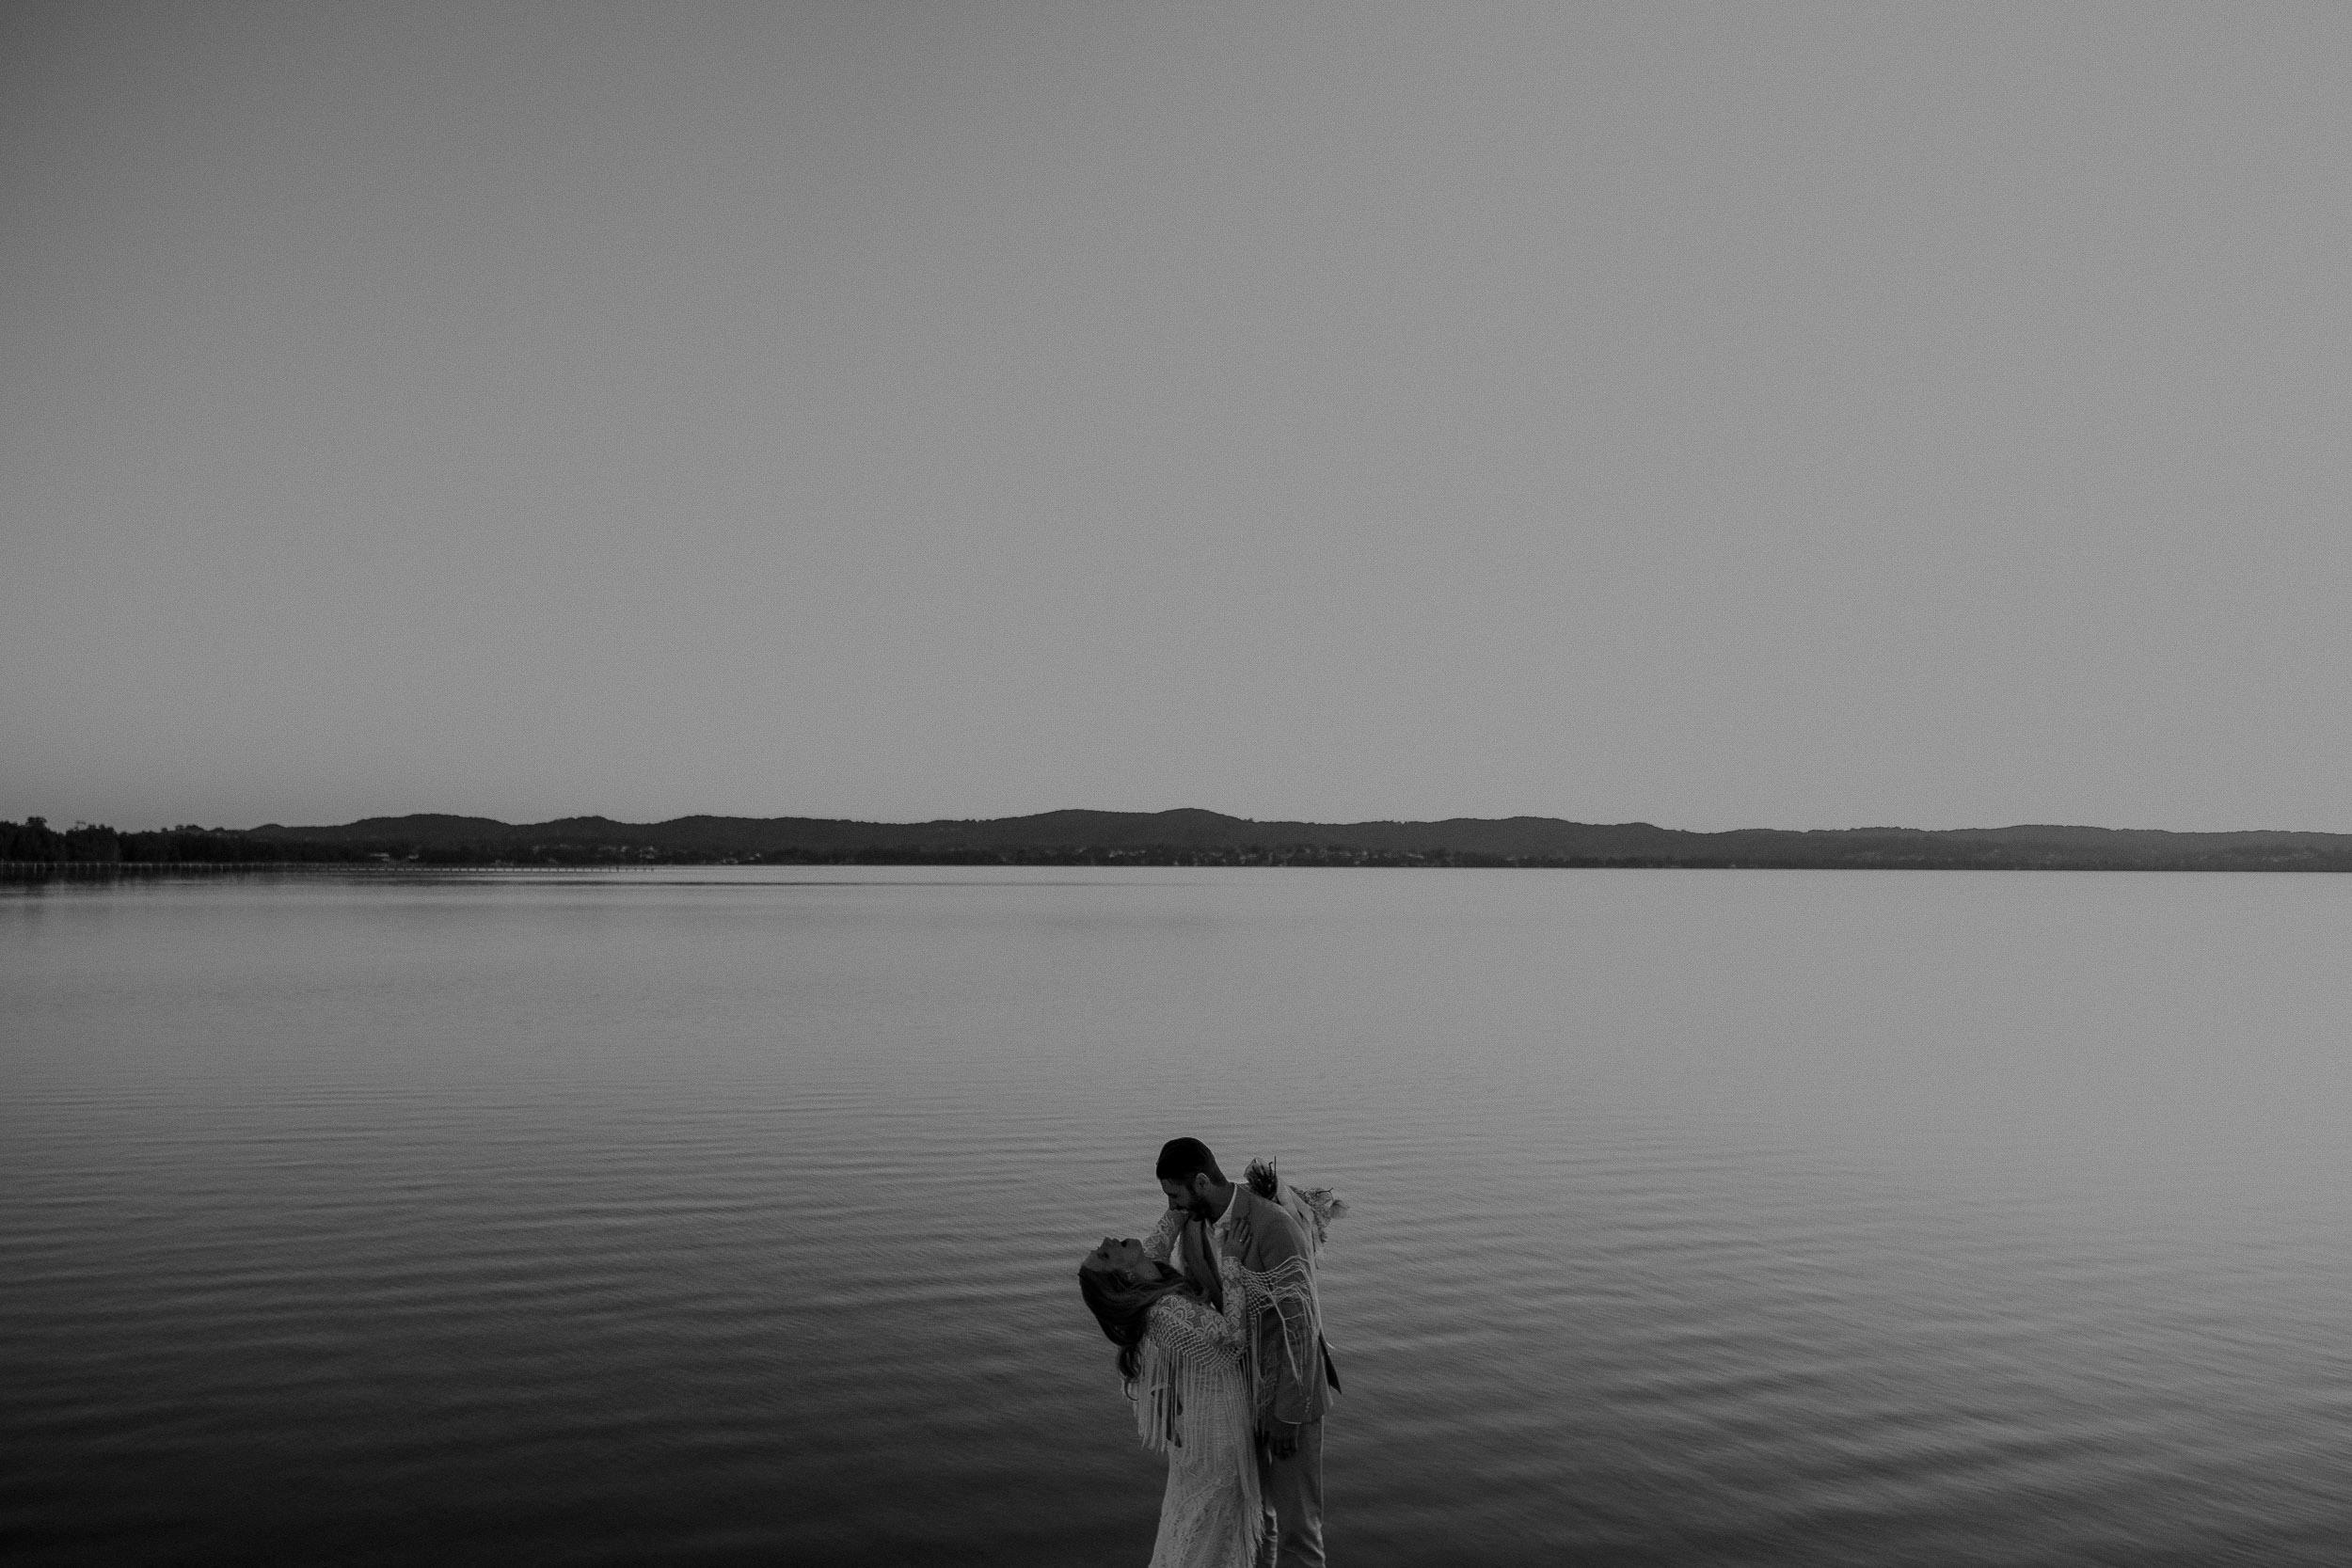 S&A Elopement - Kings & Thieves - Shred 'Til Dead - Central Coast Beach Forest Wedding - 398.jpg